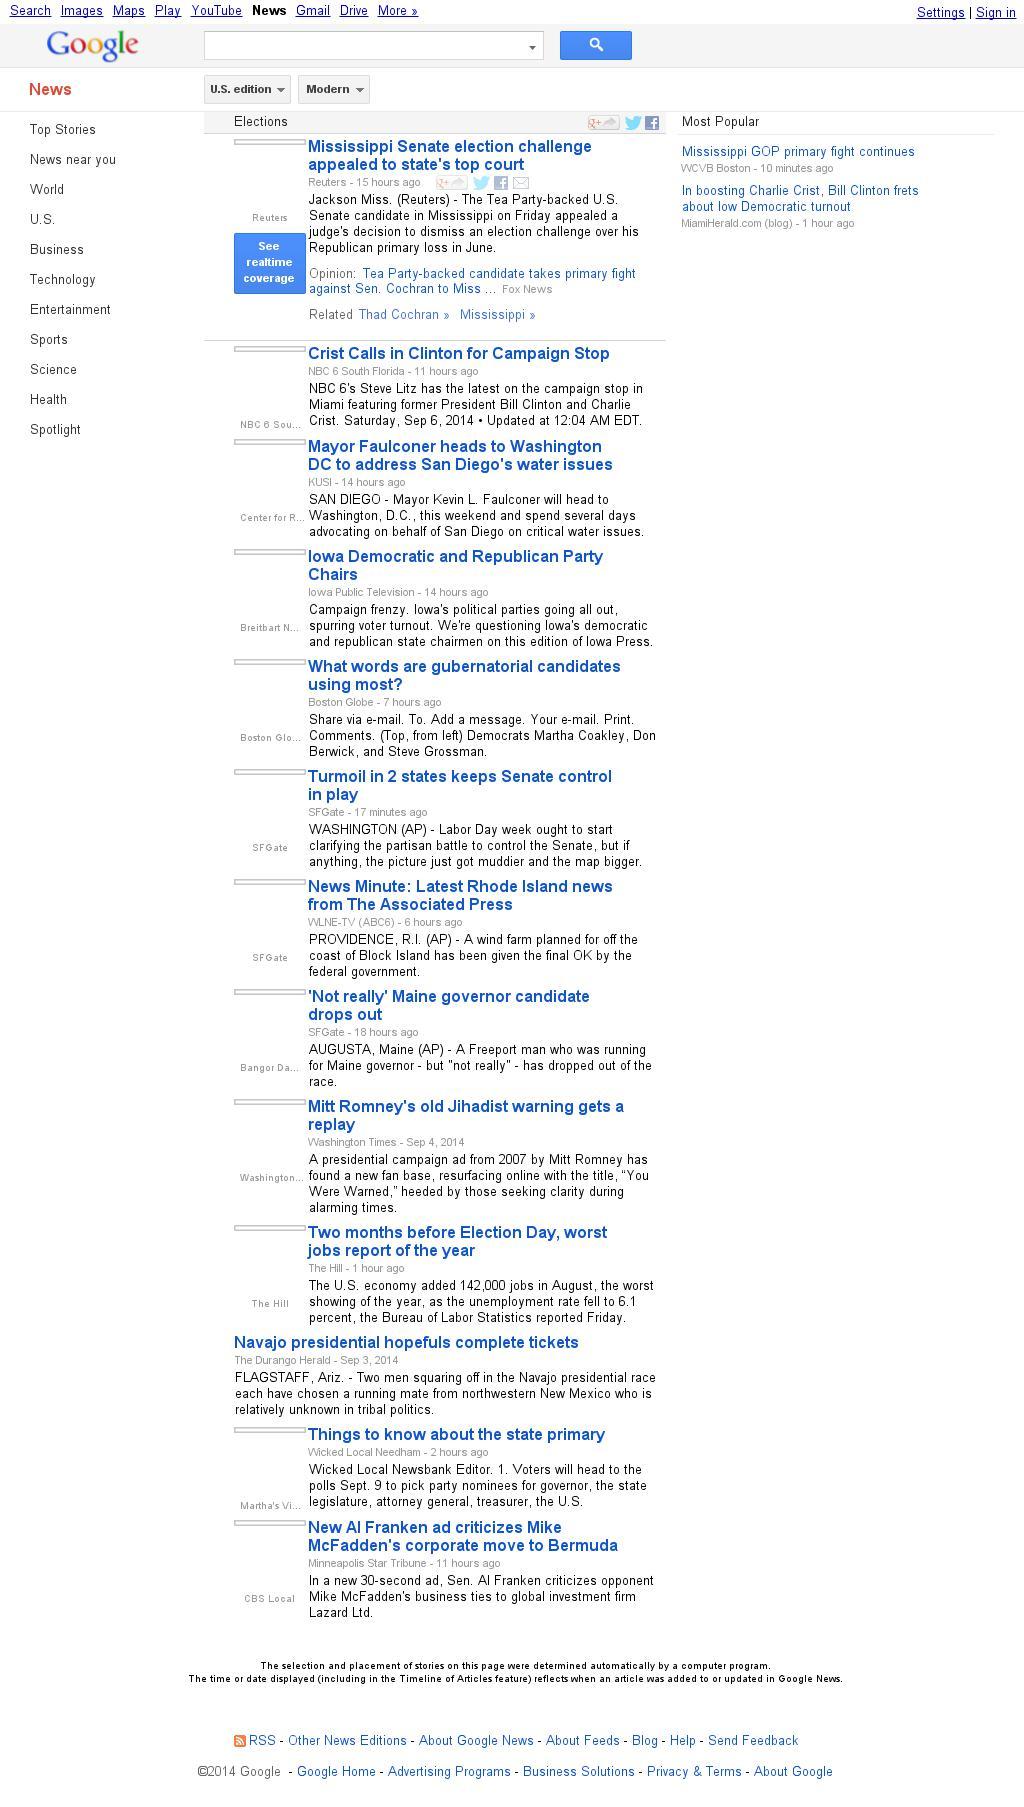 Google News: Elections at Saturday Sept. 6, 2014, 2:05 p.m. UTC